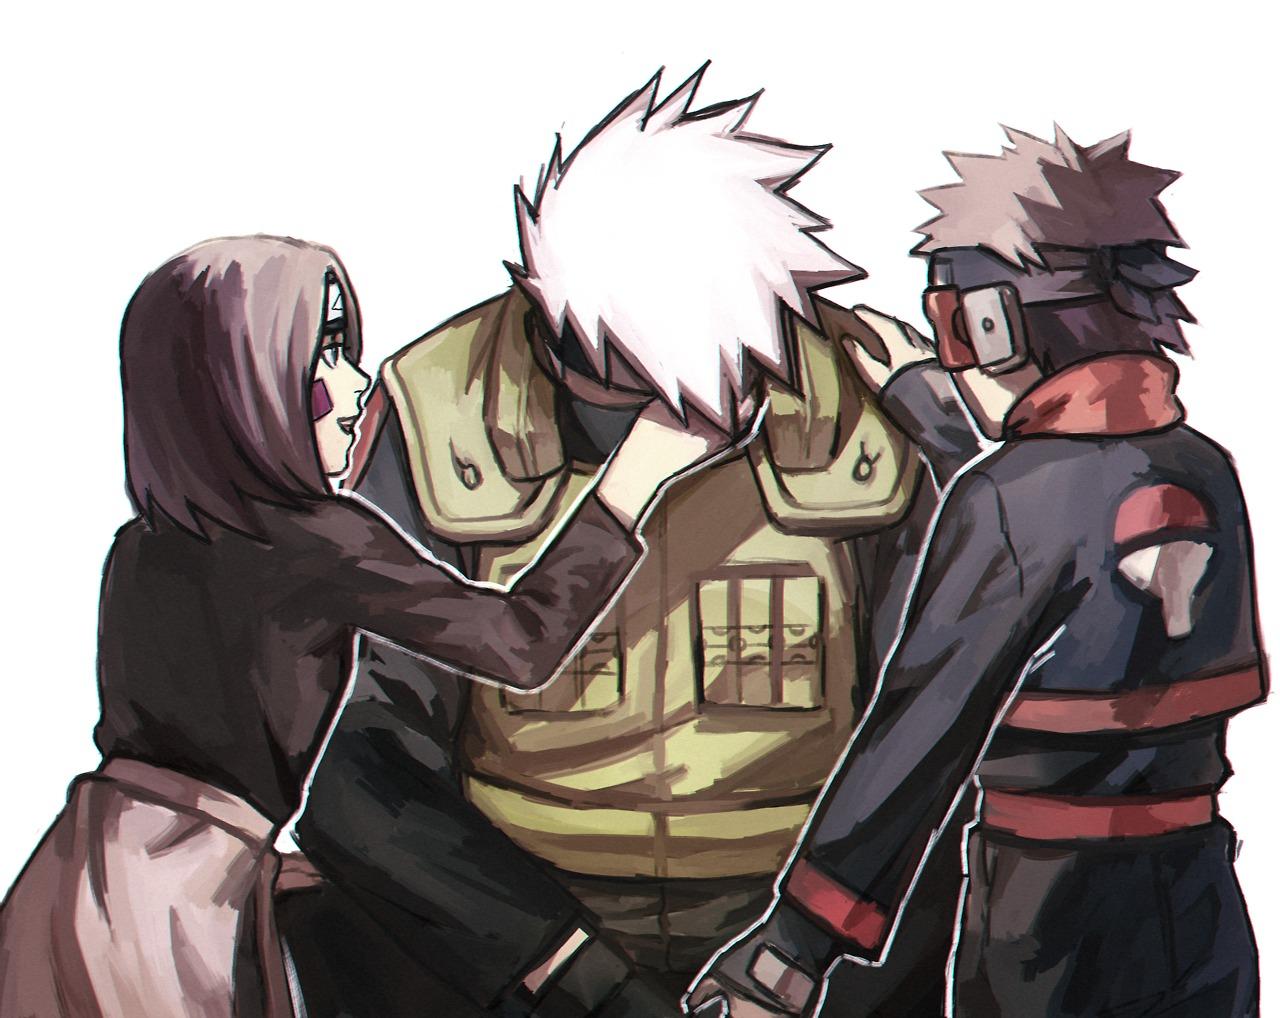 Kakashi hình nền with anime called Kakashi, Rin and Obito